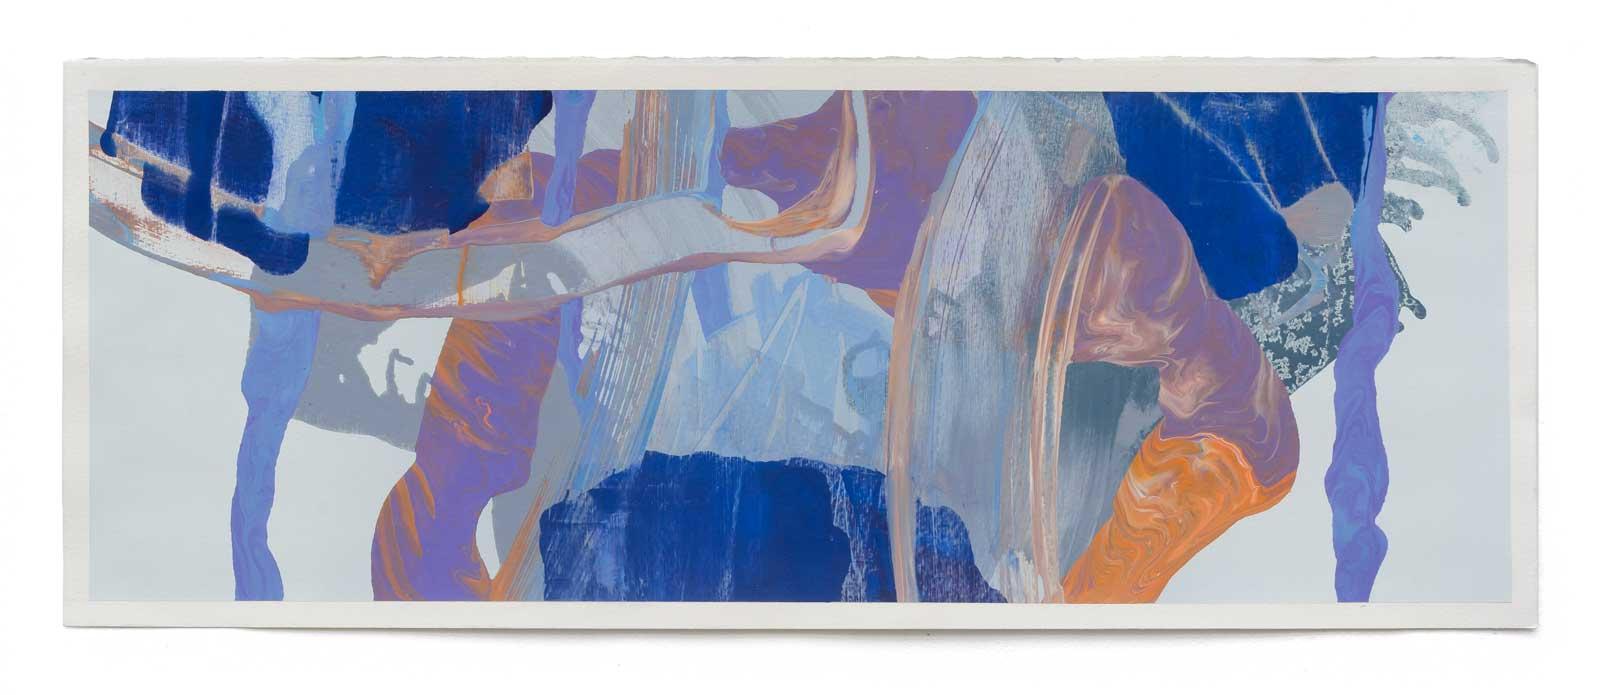 Disruptions-8-oil-on-paper-25.4 cm x 71.12 cm.